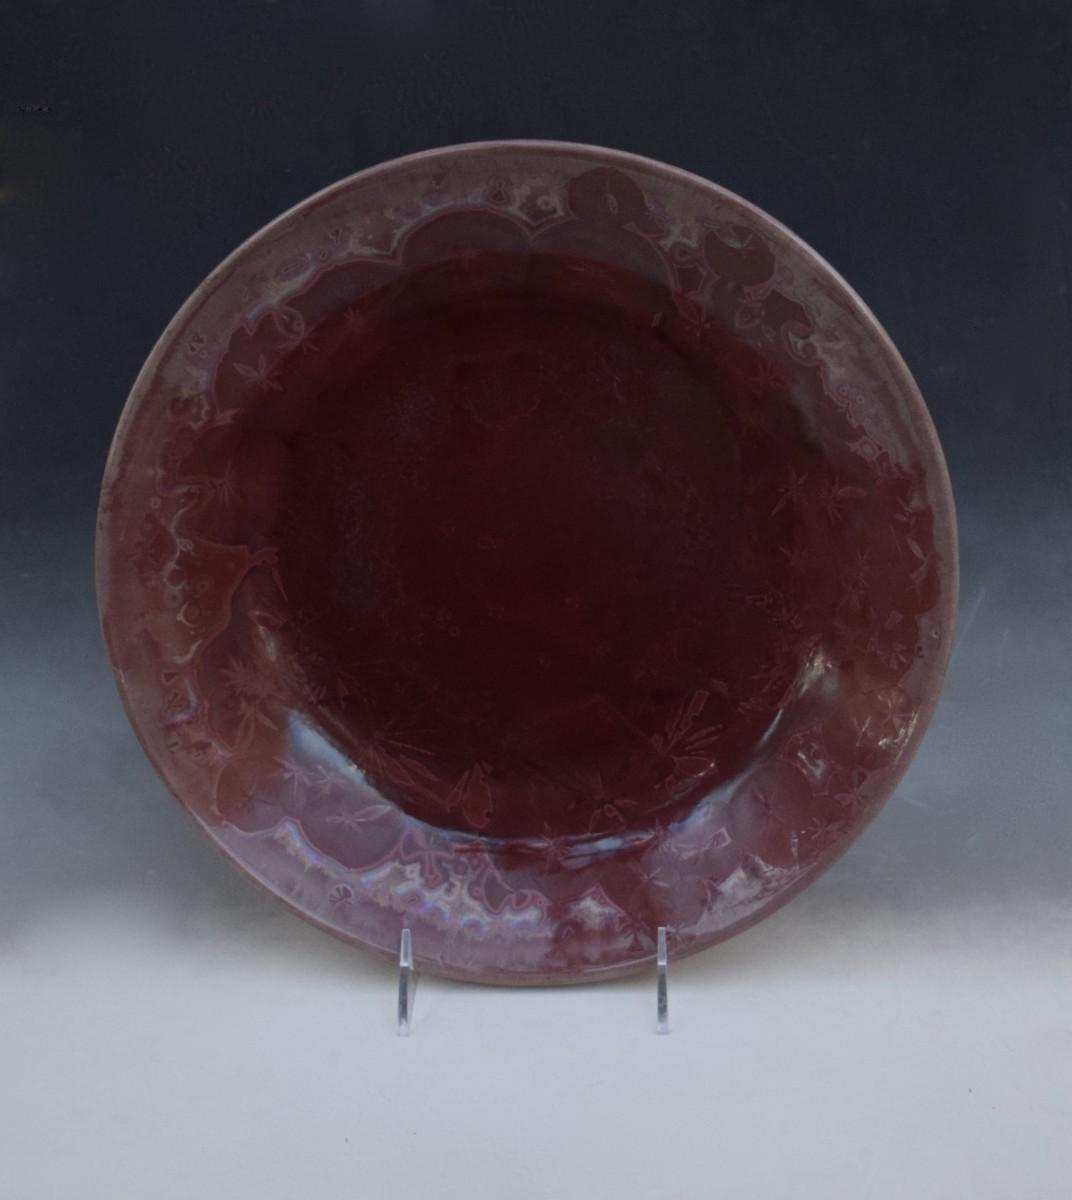 Large Red Bowl by Nichole Vikdal